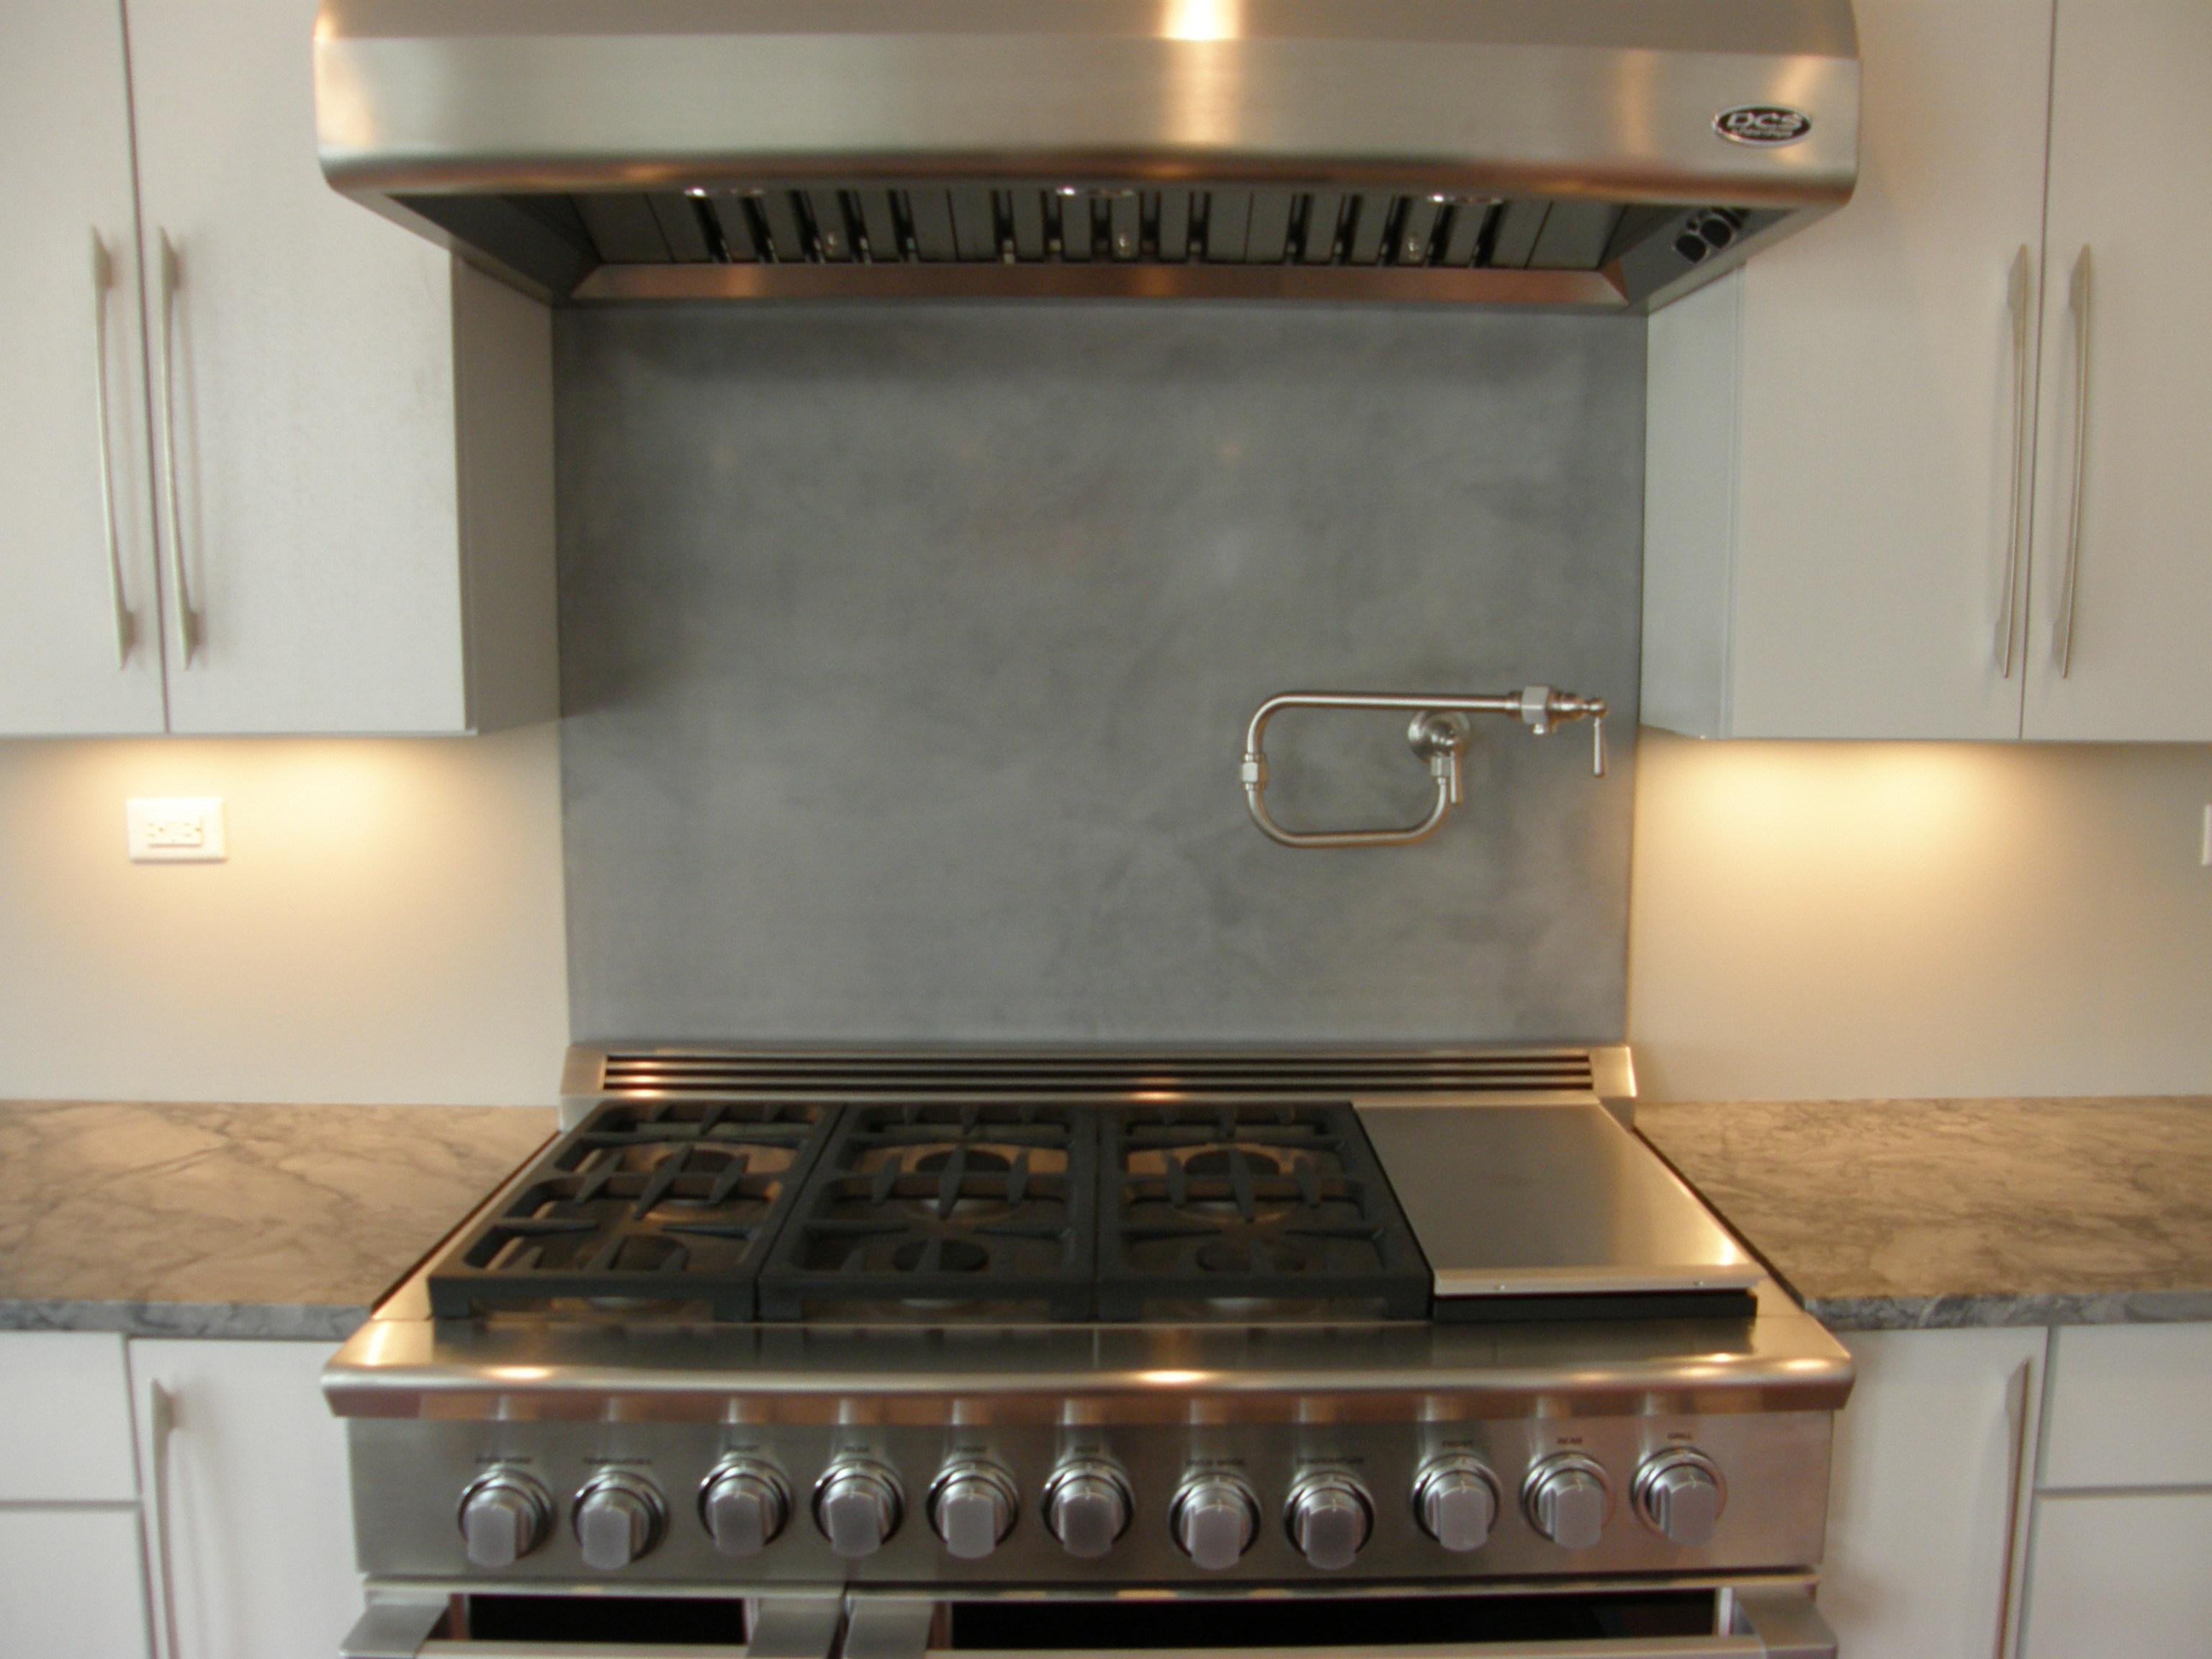 Concrete Backsplash Ideas for Kitchens - HomesFeed on Modern Backsplash For Dark Countertops  id=14214